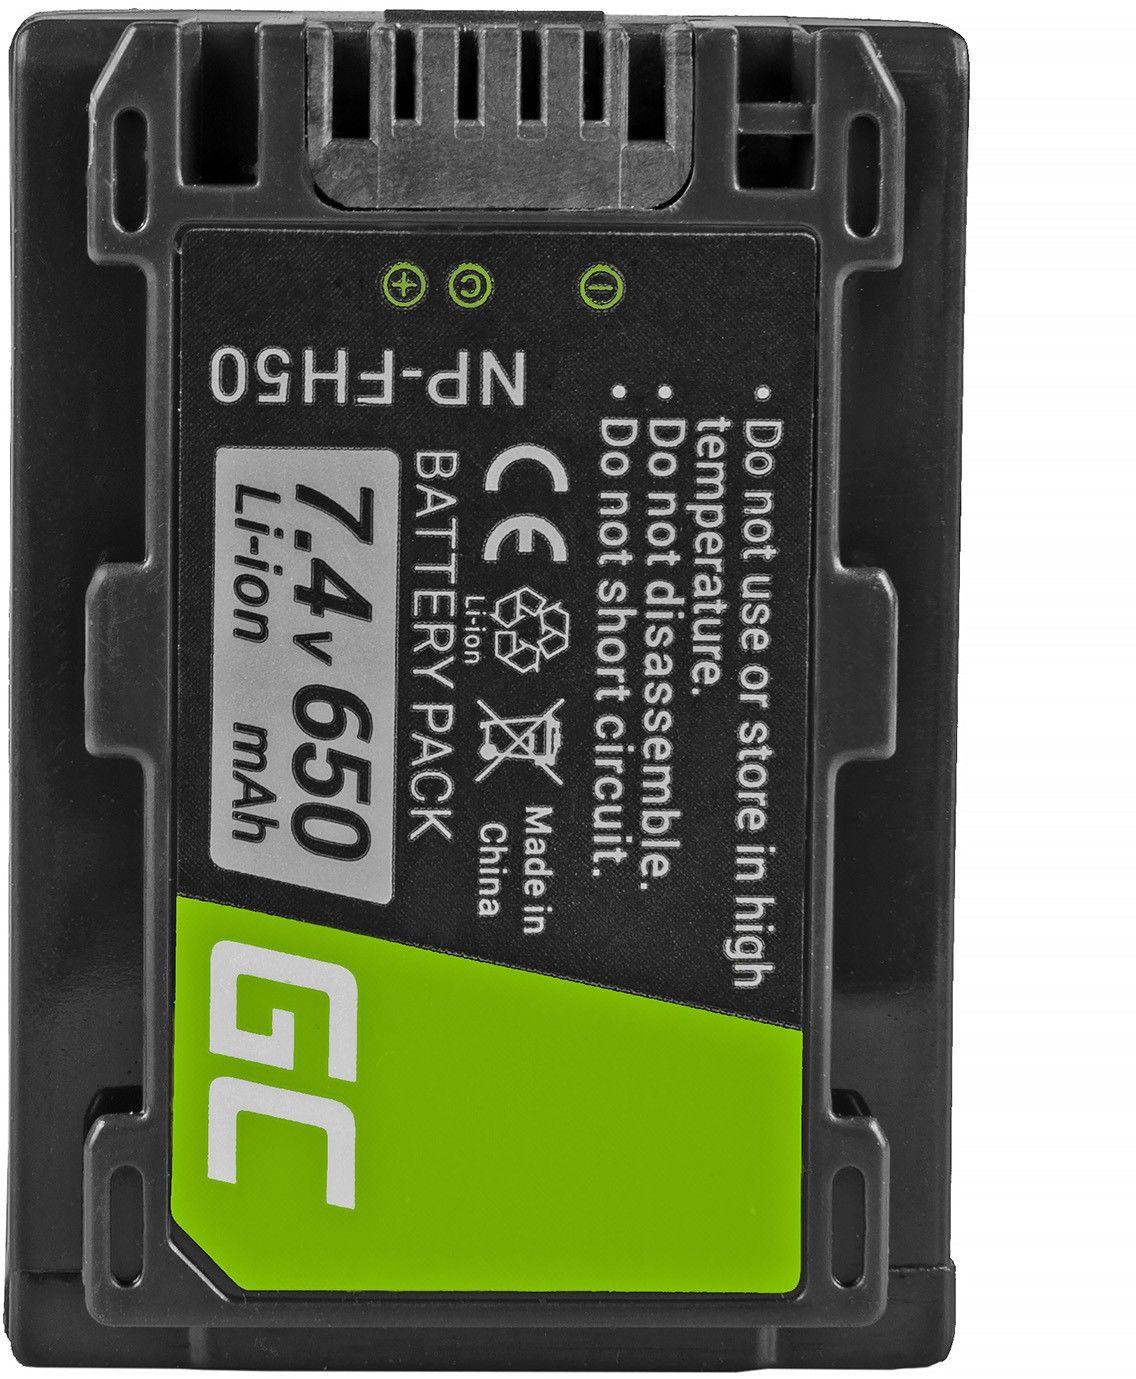 Akumulator Bateria Green Cell  NP-FH30 NP-FH40 NP-FH50 do Sony DCR HC22E HC24E HC42 SR36E SR37E SR100 DSC-HX200V 7.4V 650mAh